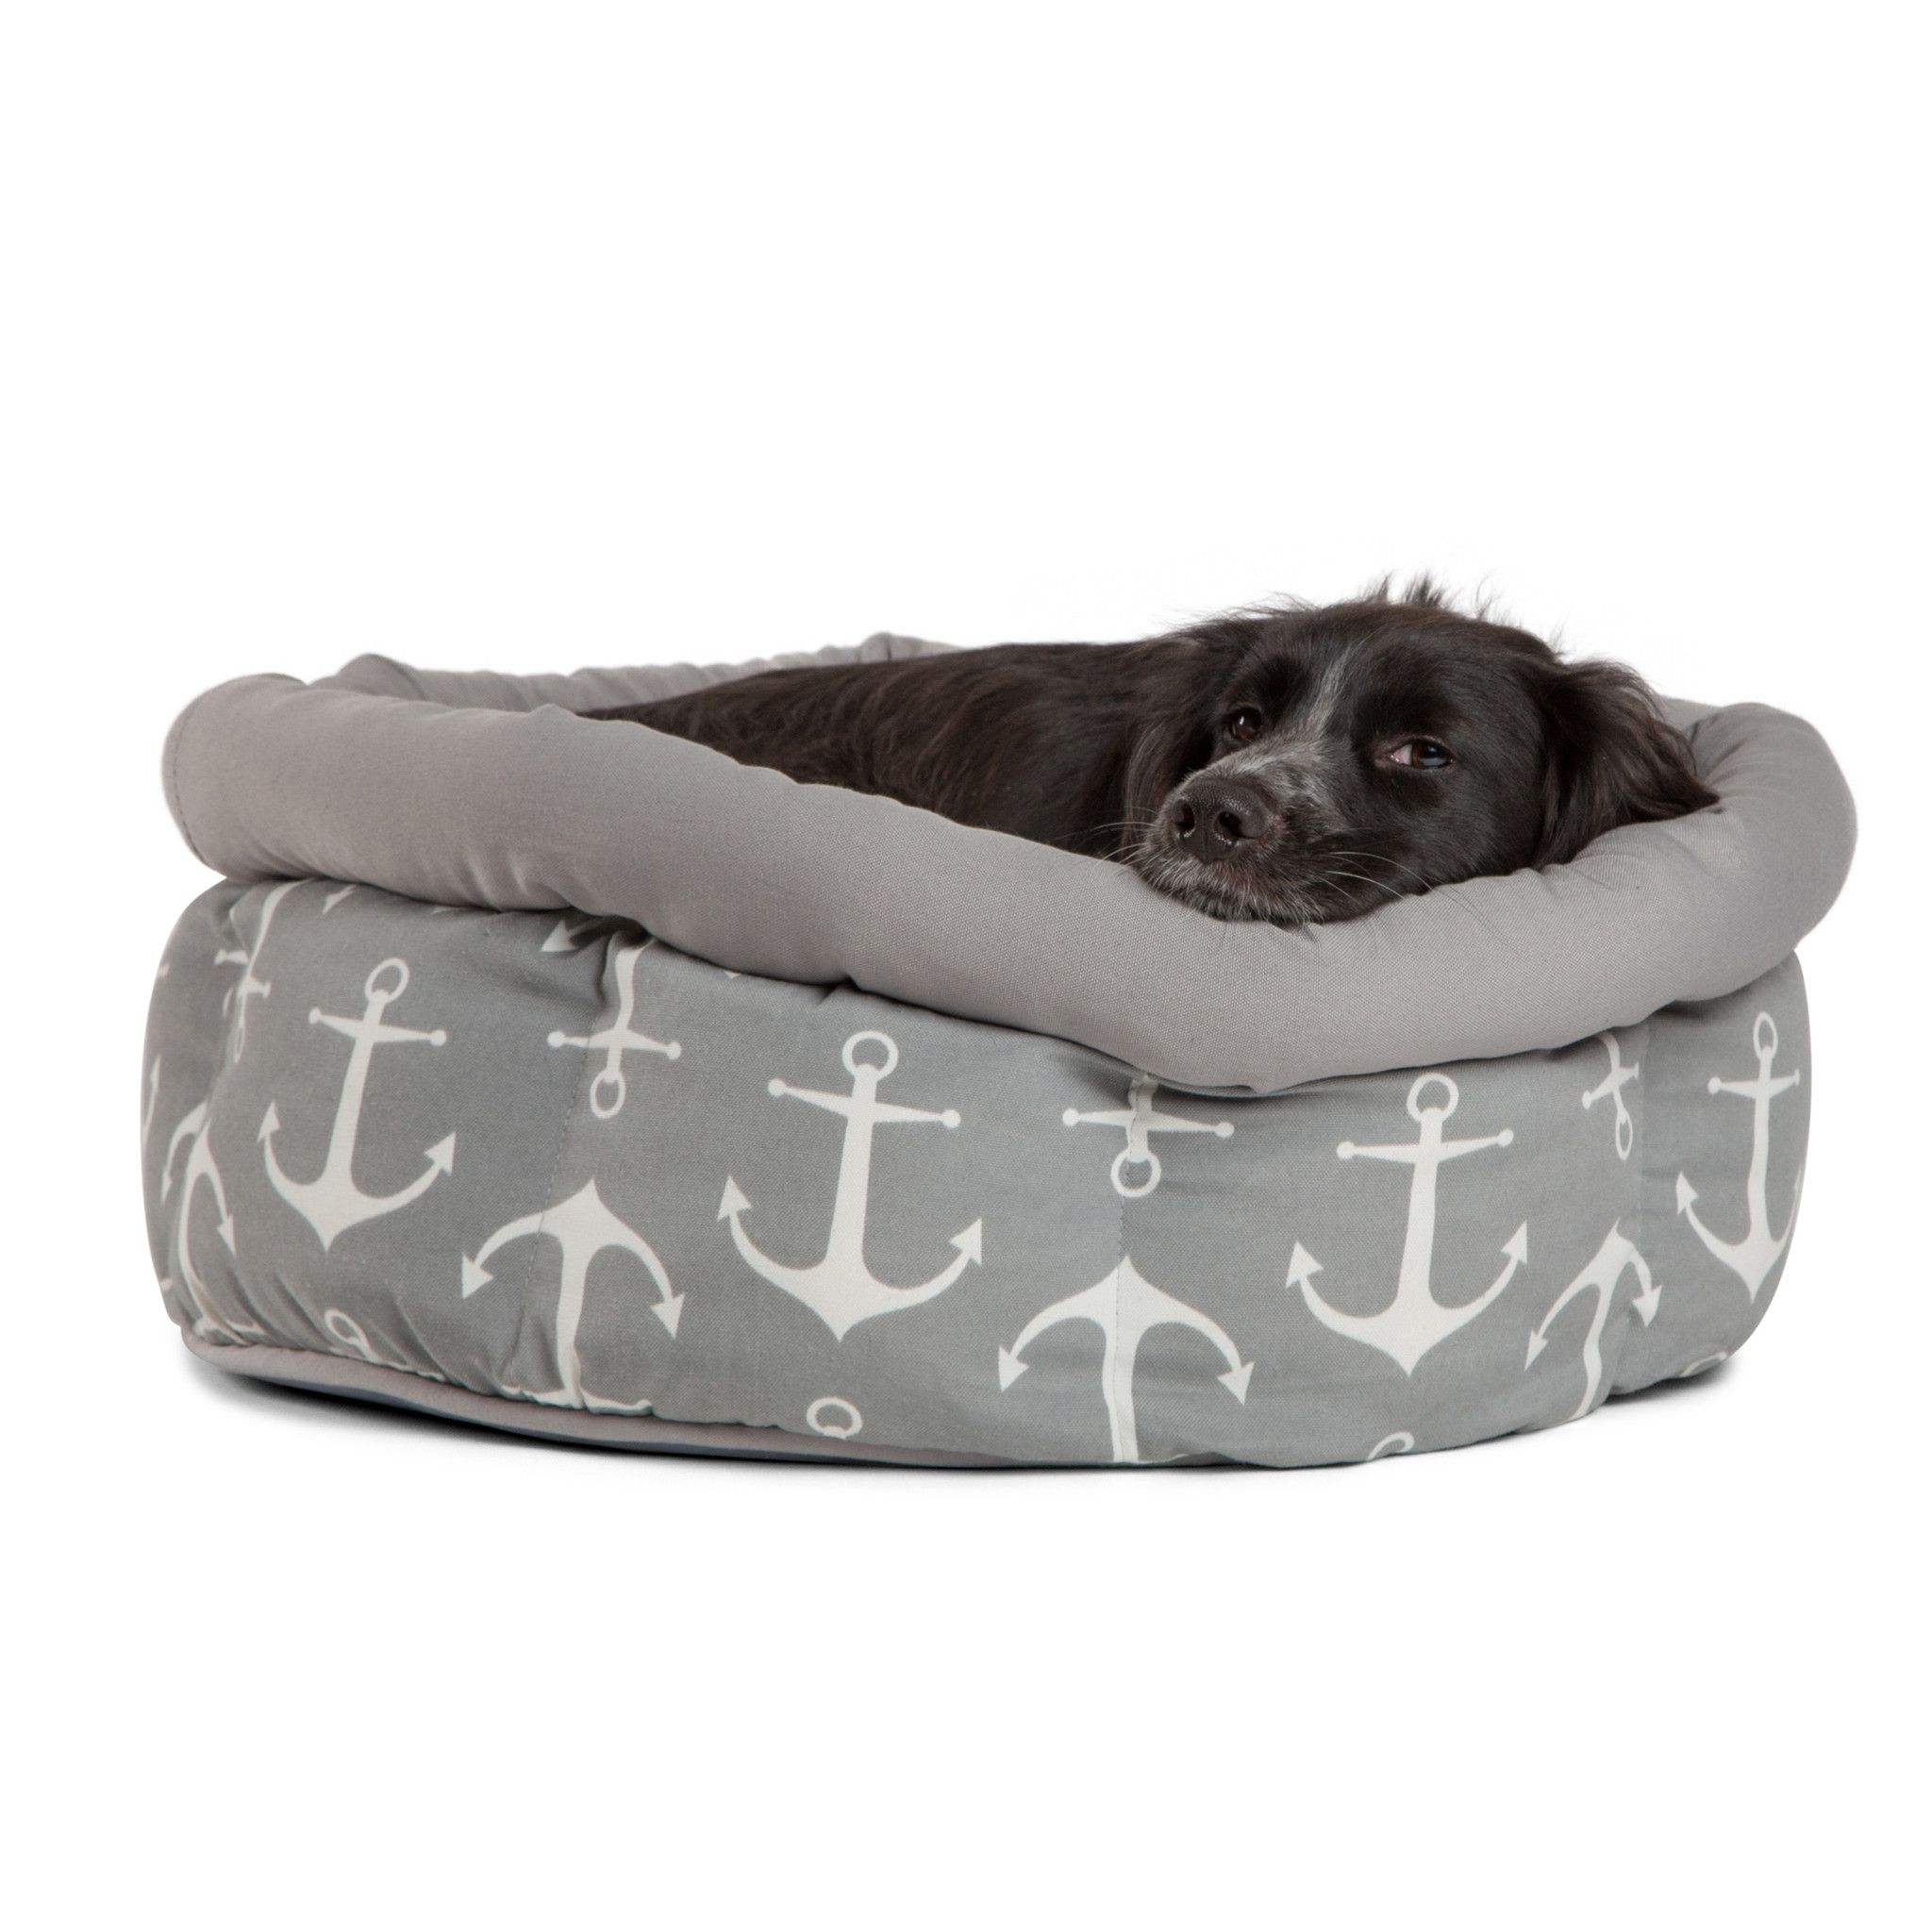 Grey Dog Bed Or Cat Bed Teddy Cuddler In Anchor Fog Jumbo